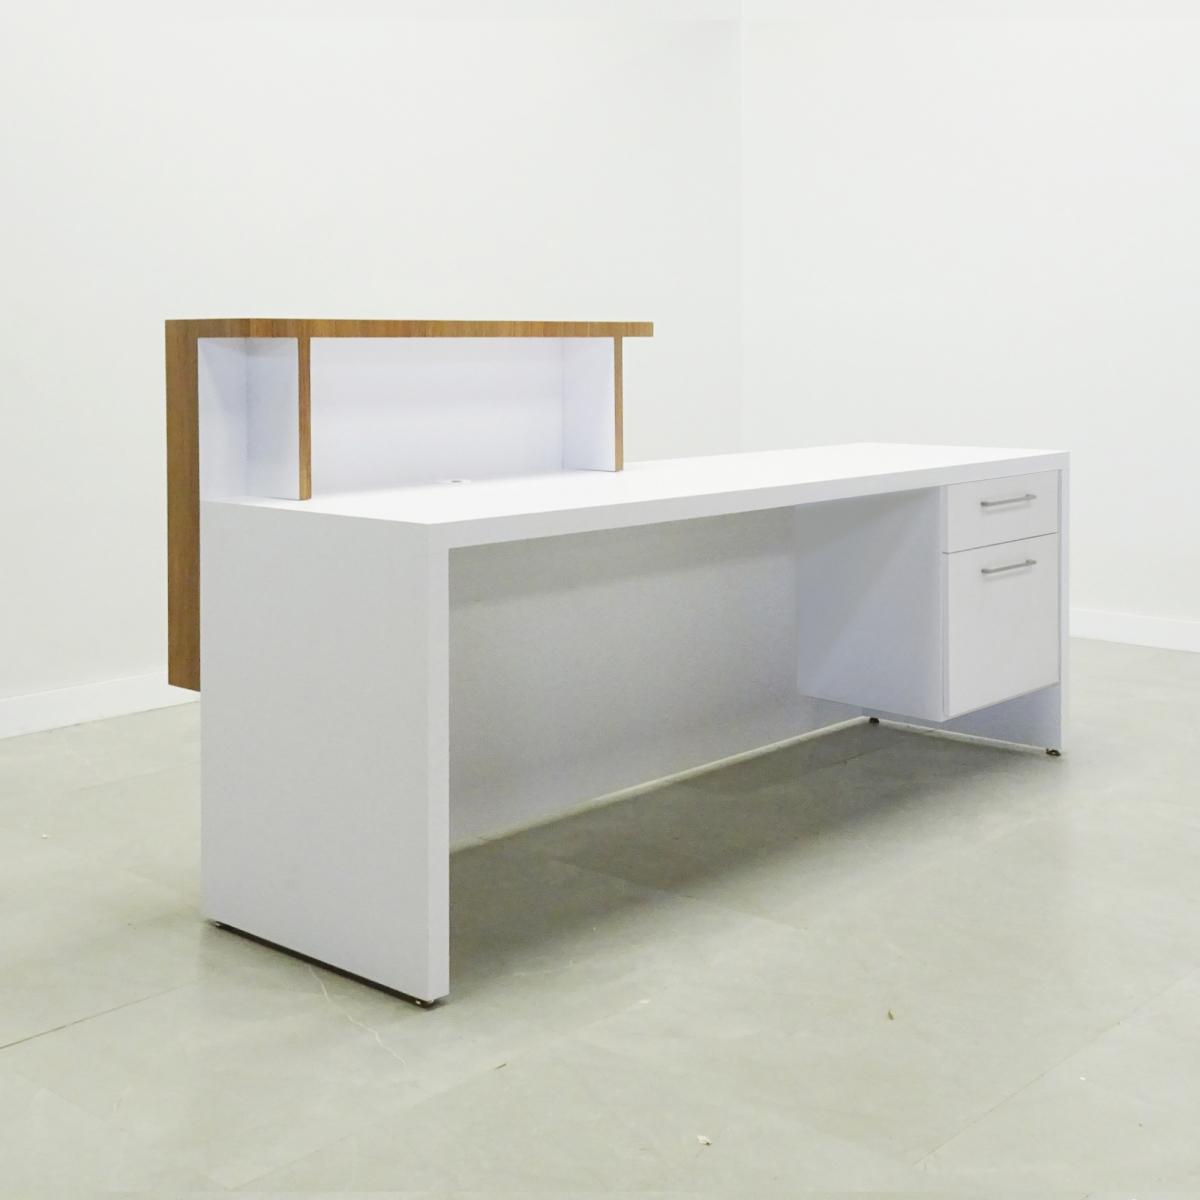 84 In. Los Angeles Reception Desk with Storage